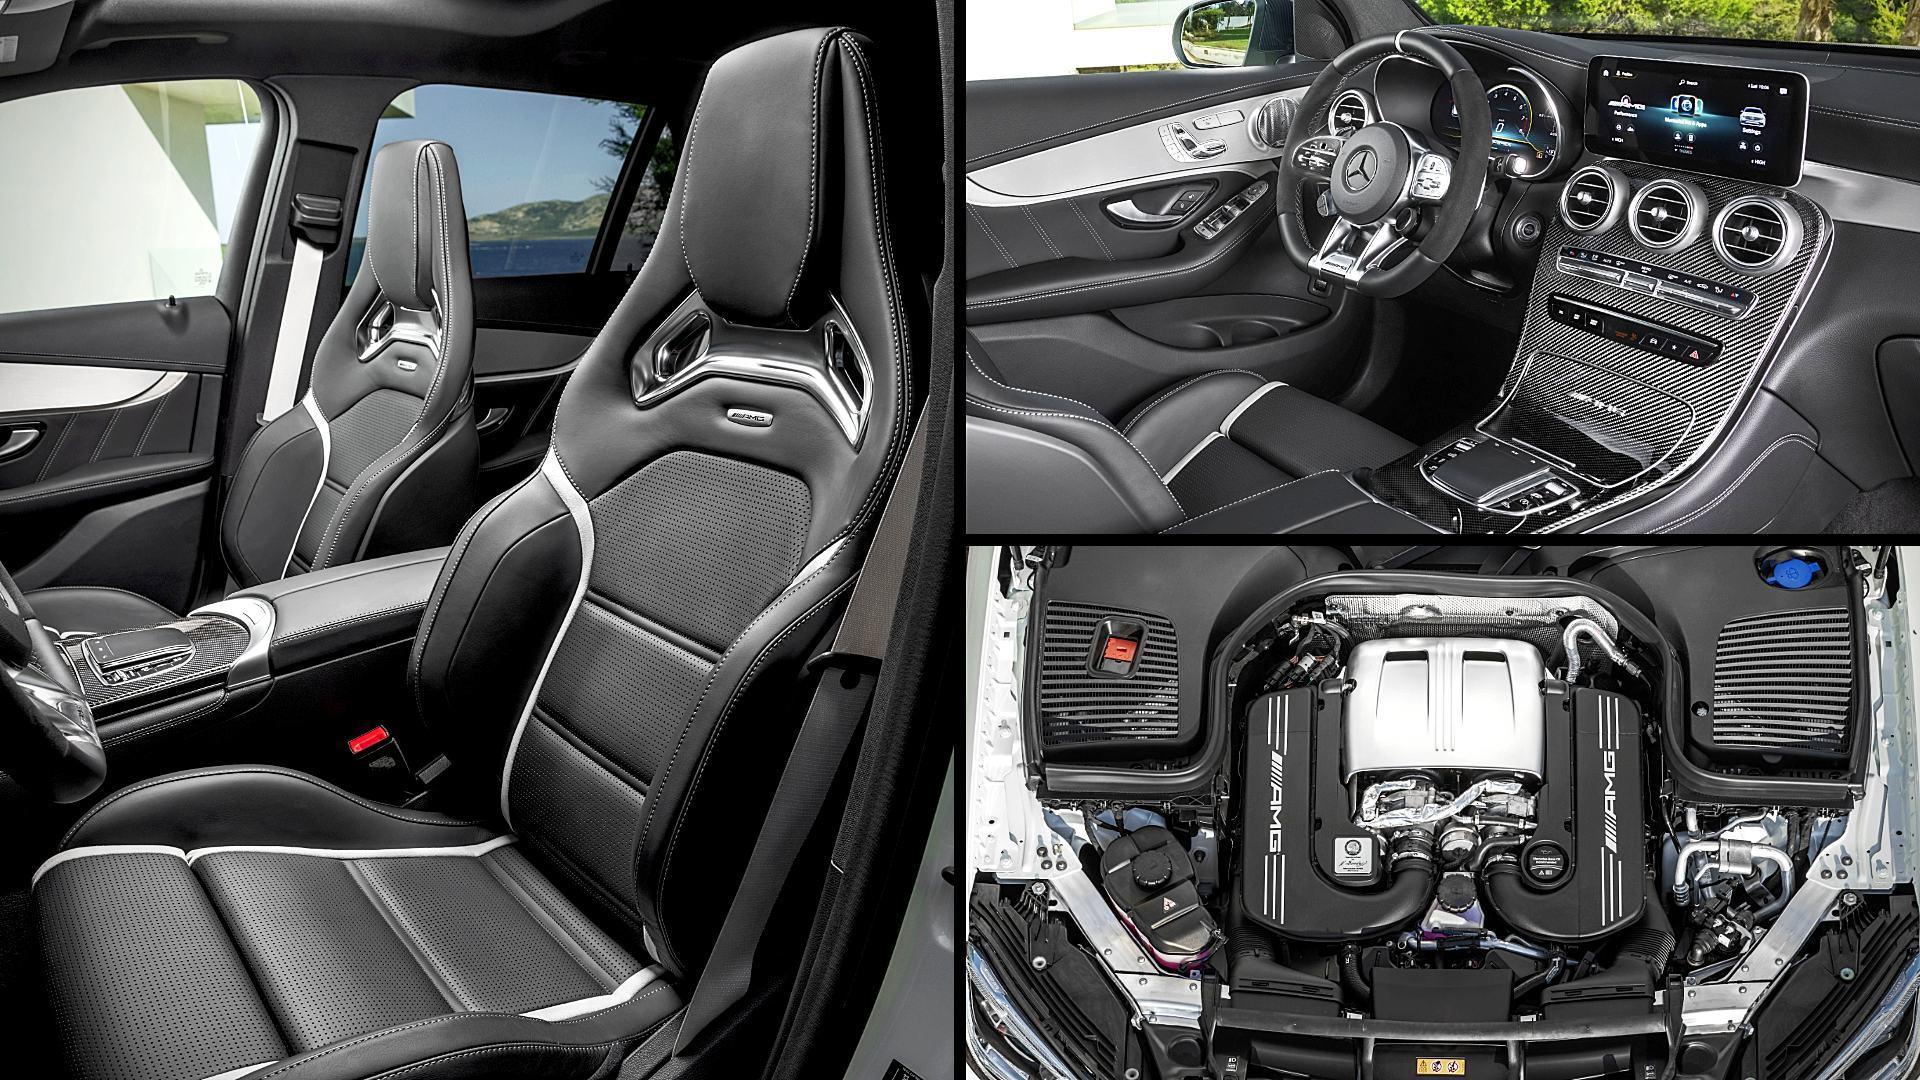 2020 Mercedes GLC SUV Models Interior